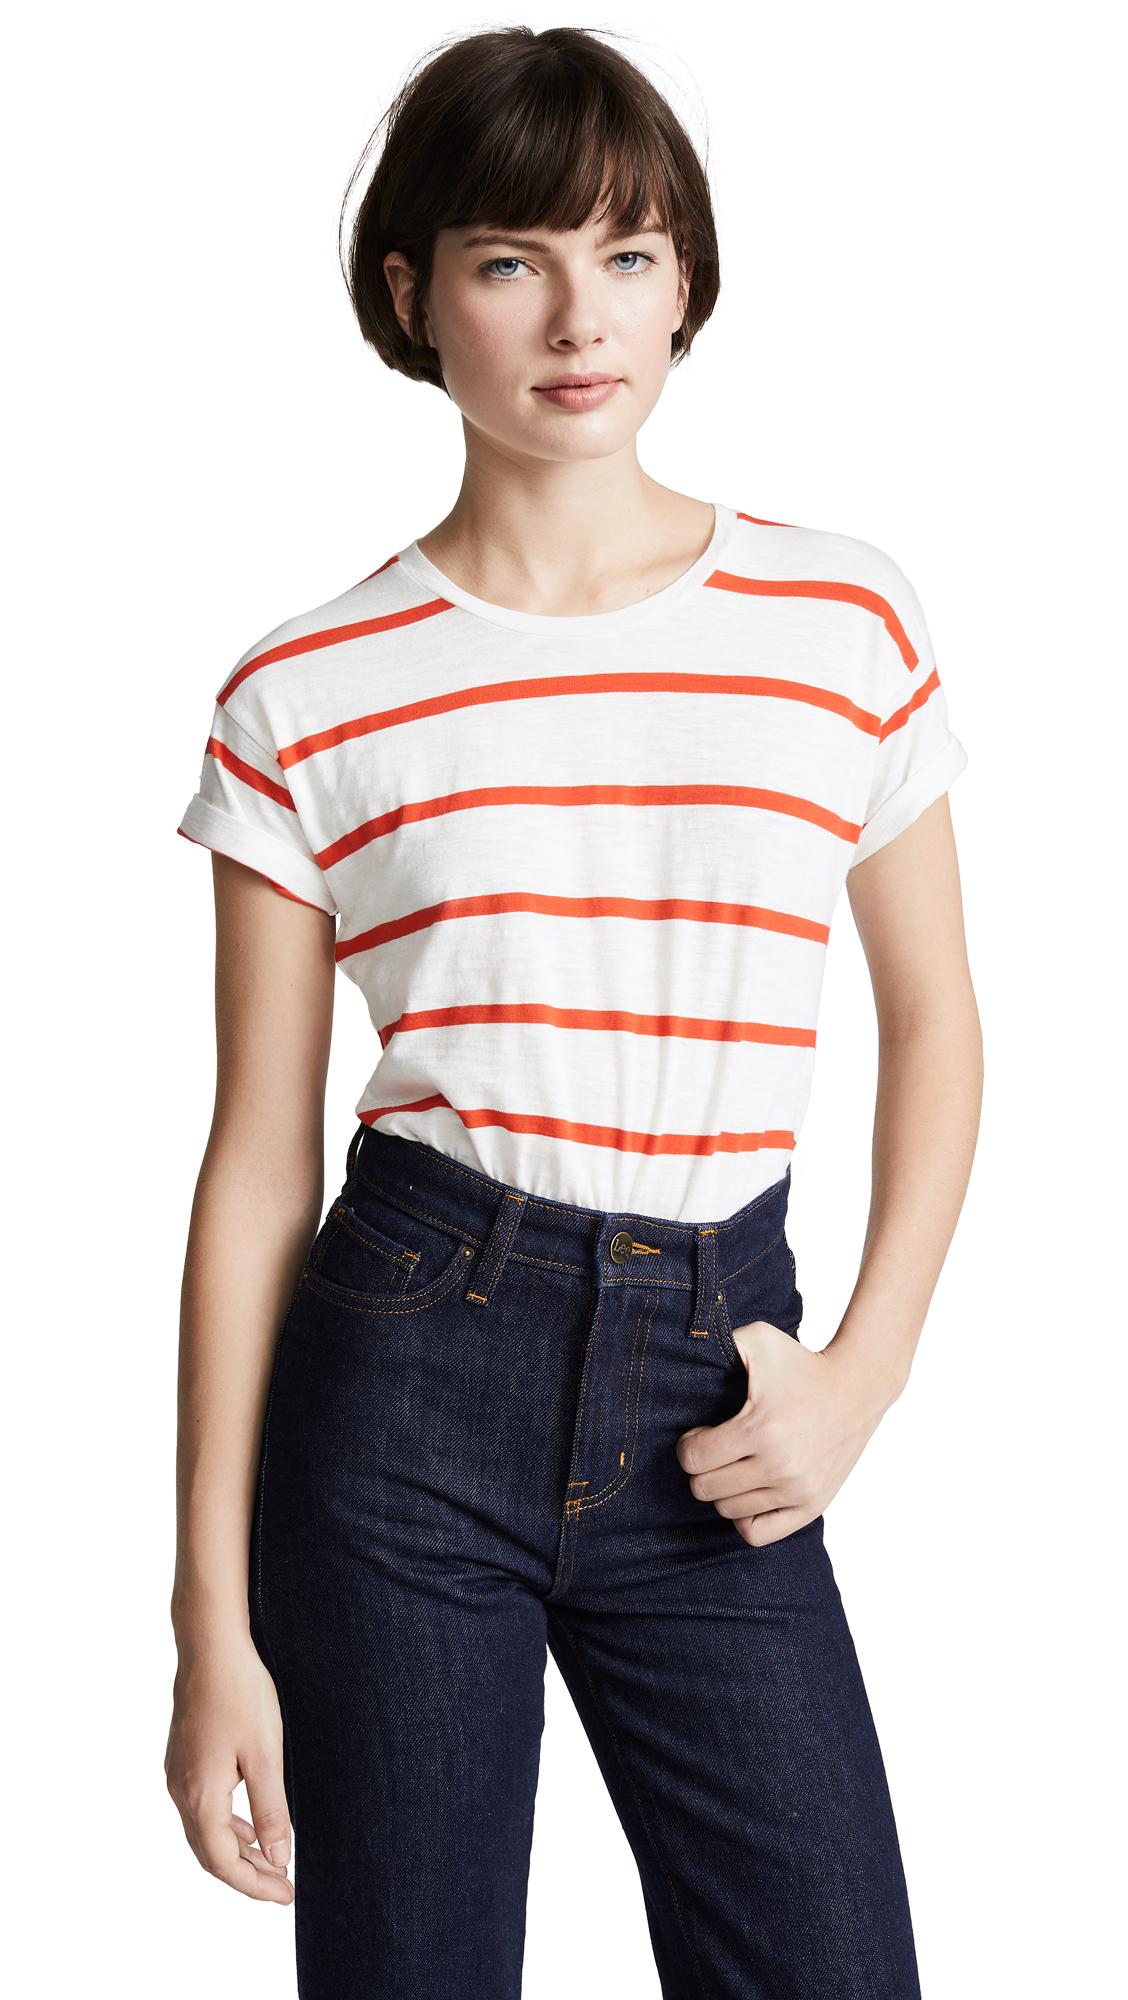 Madewell Whisper Stripe Crew Neck Tee - Red/White